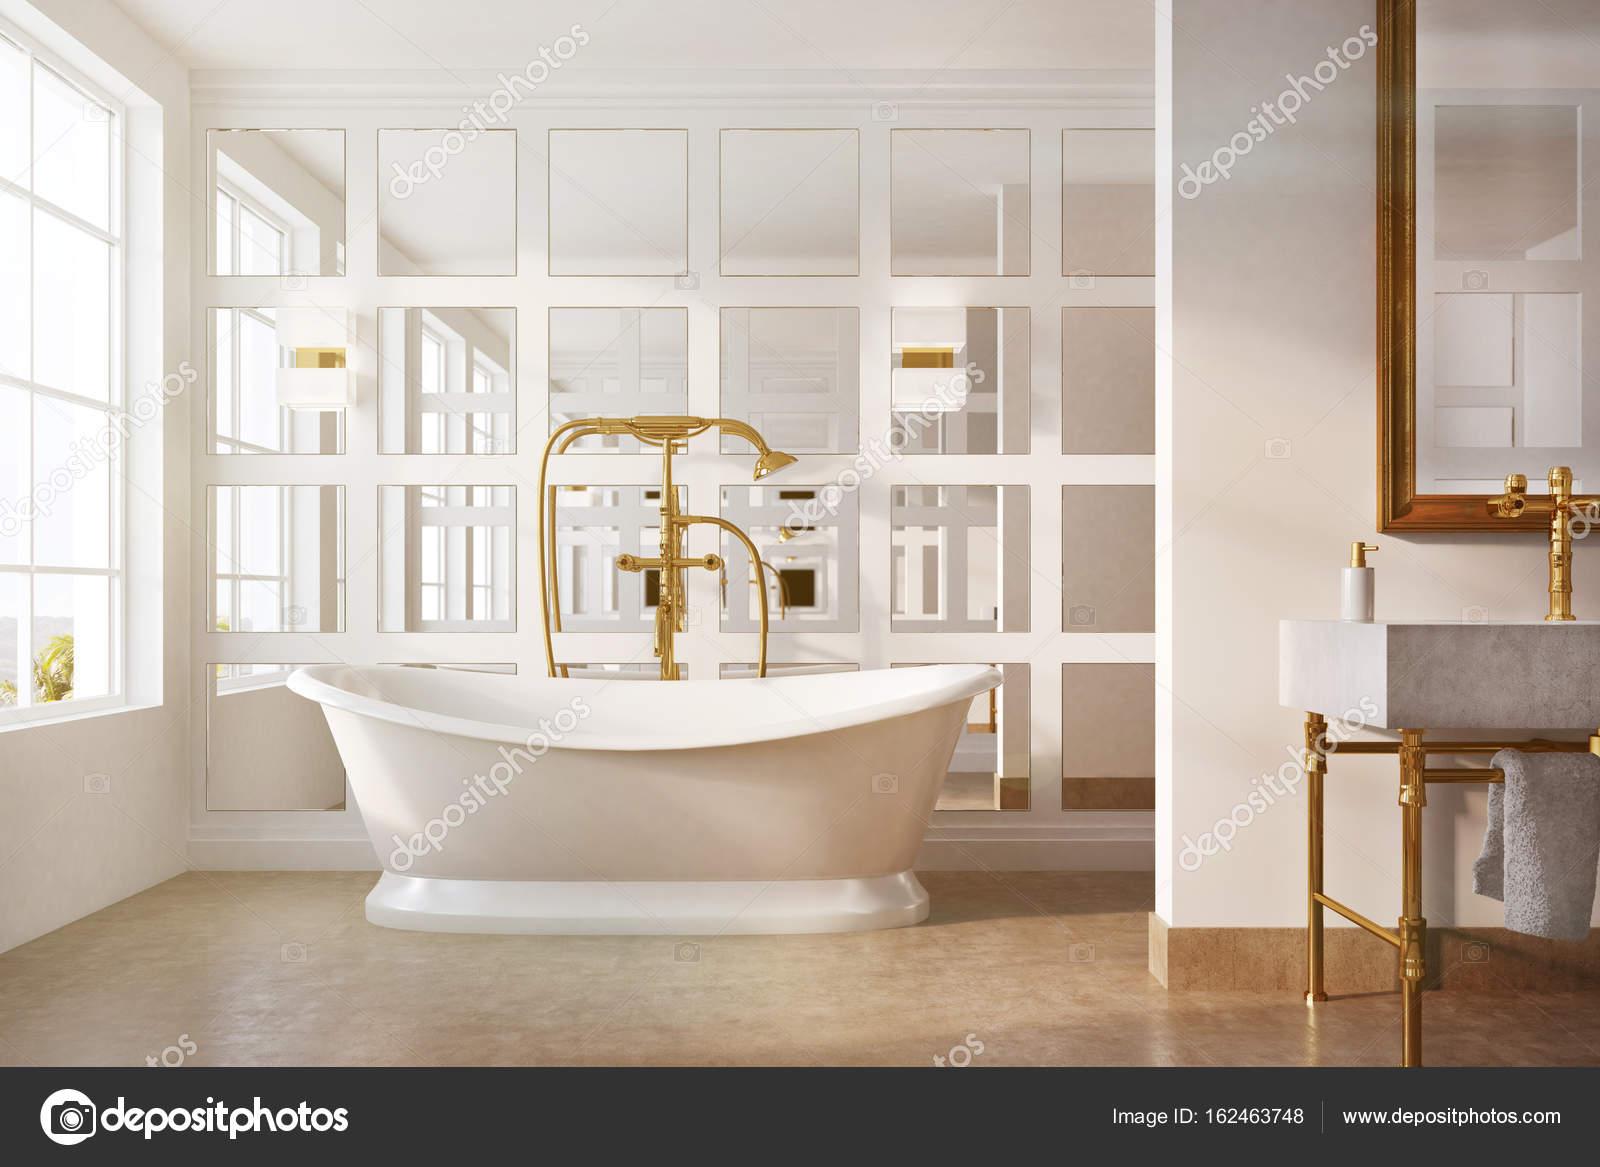 Vasca da bagno vintage prezzi vasca da bagno in stile cleopatra bianca nera con piedi a zampa - Vasche da bagno retro ...